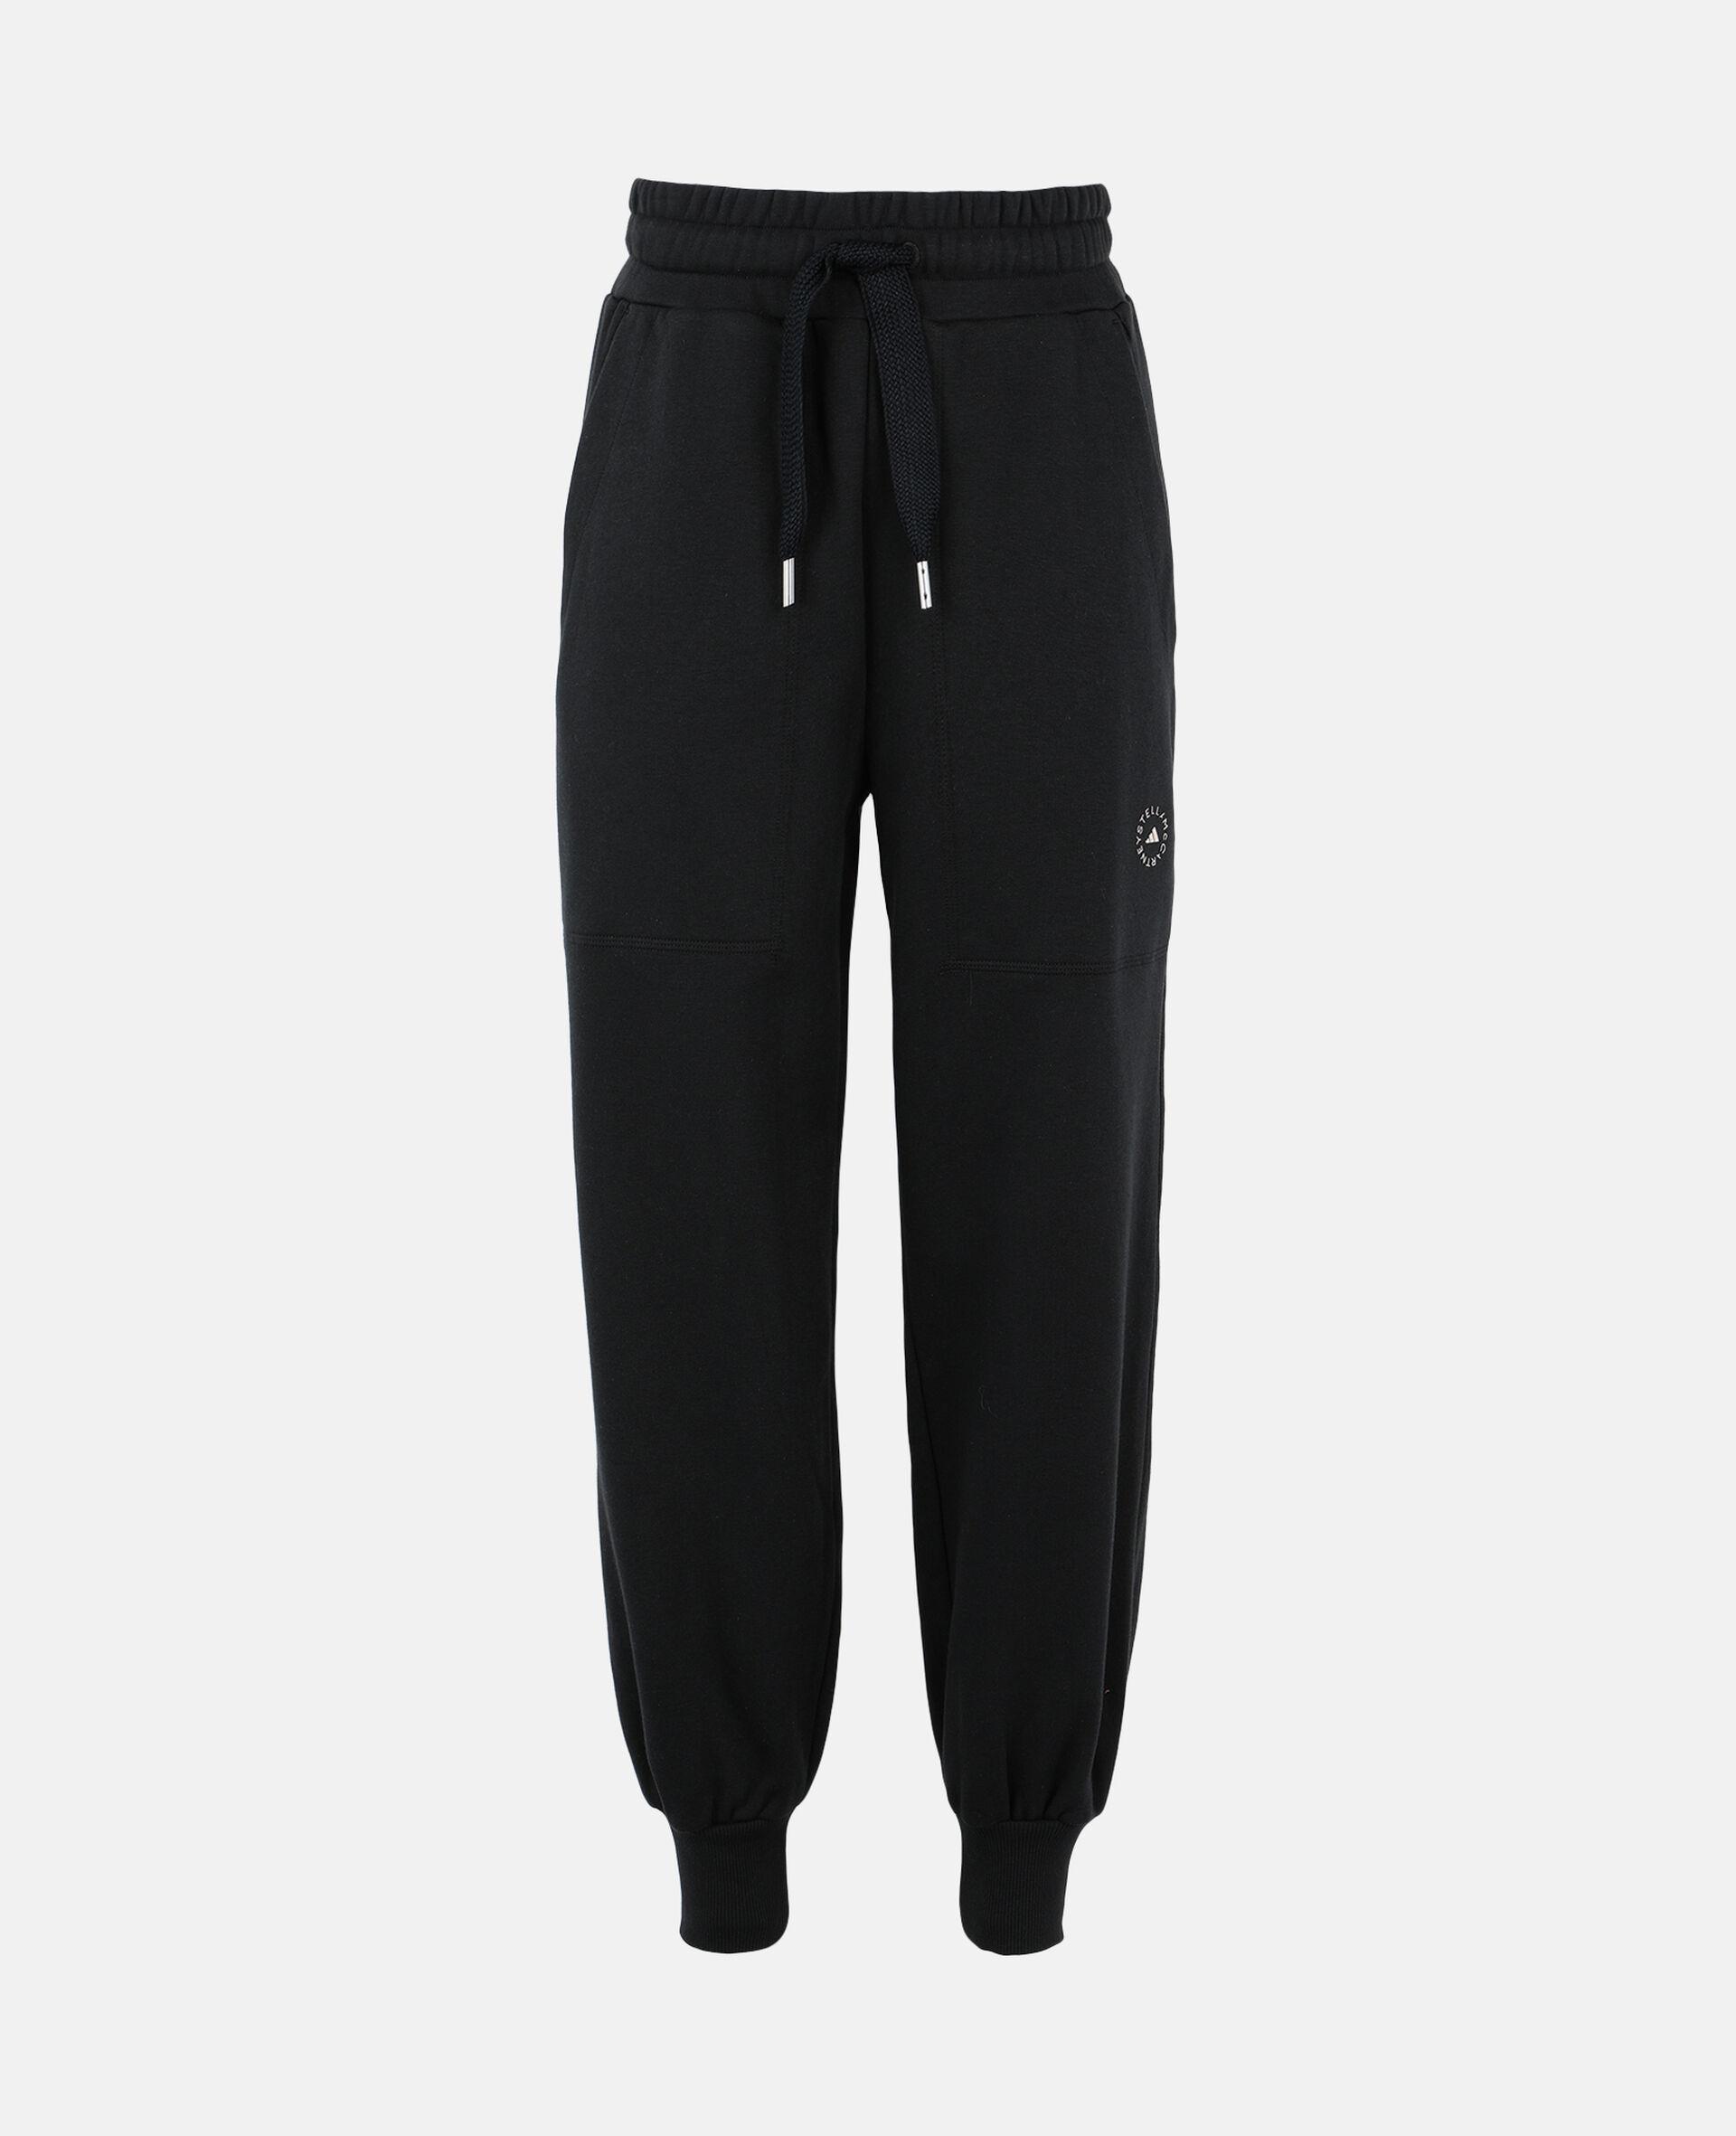 Gray Training Sweatpants-Black-large image number 0